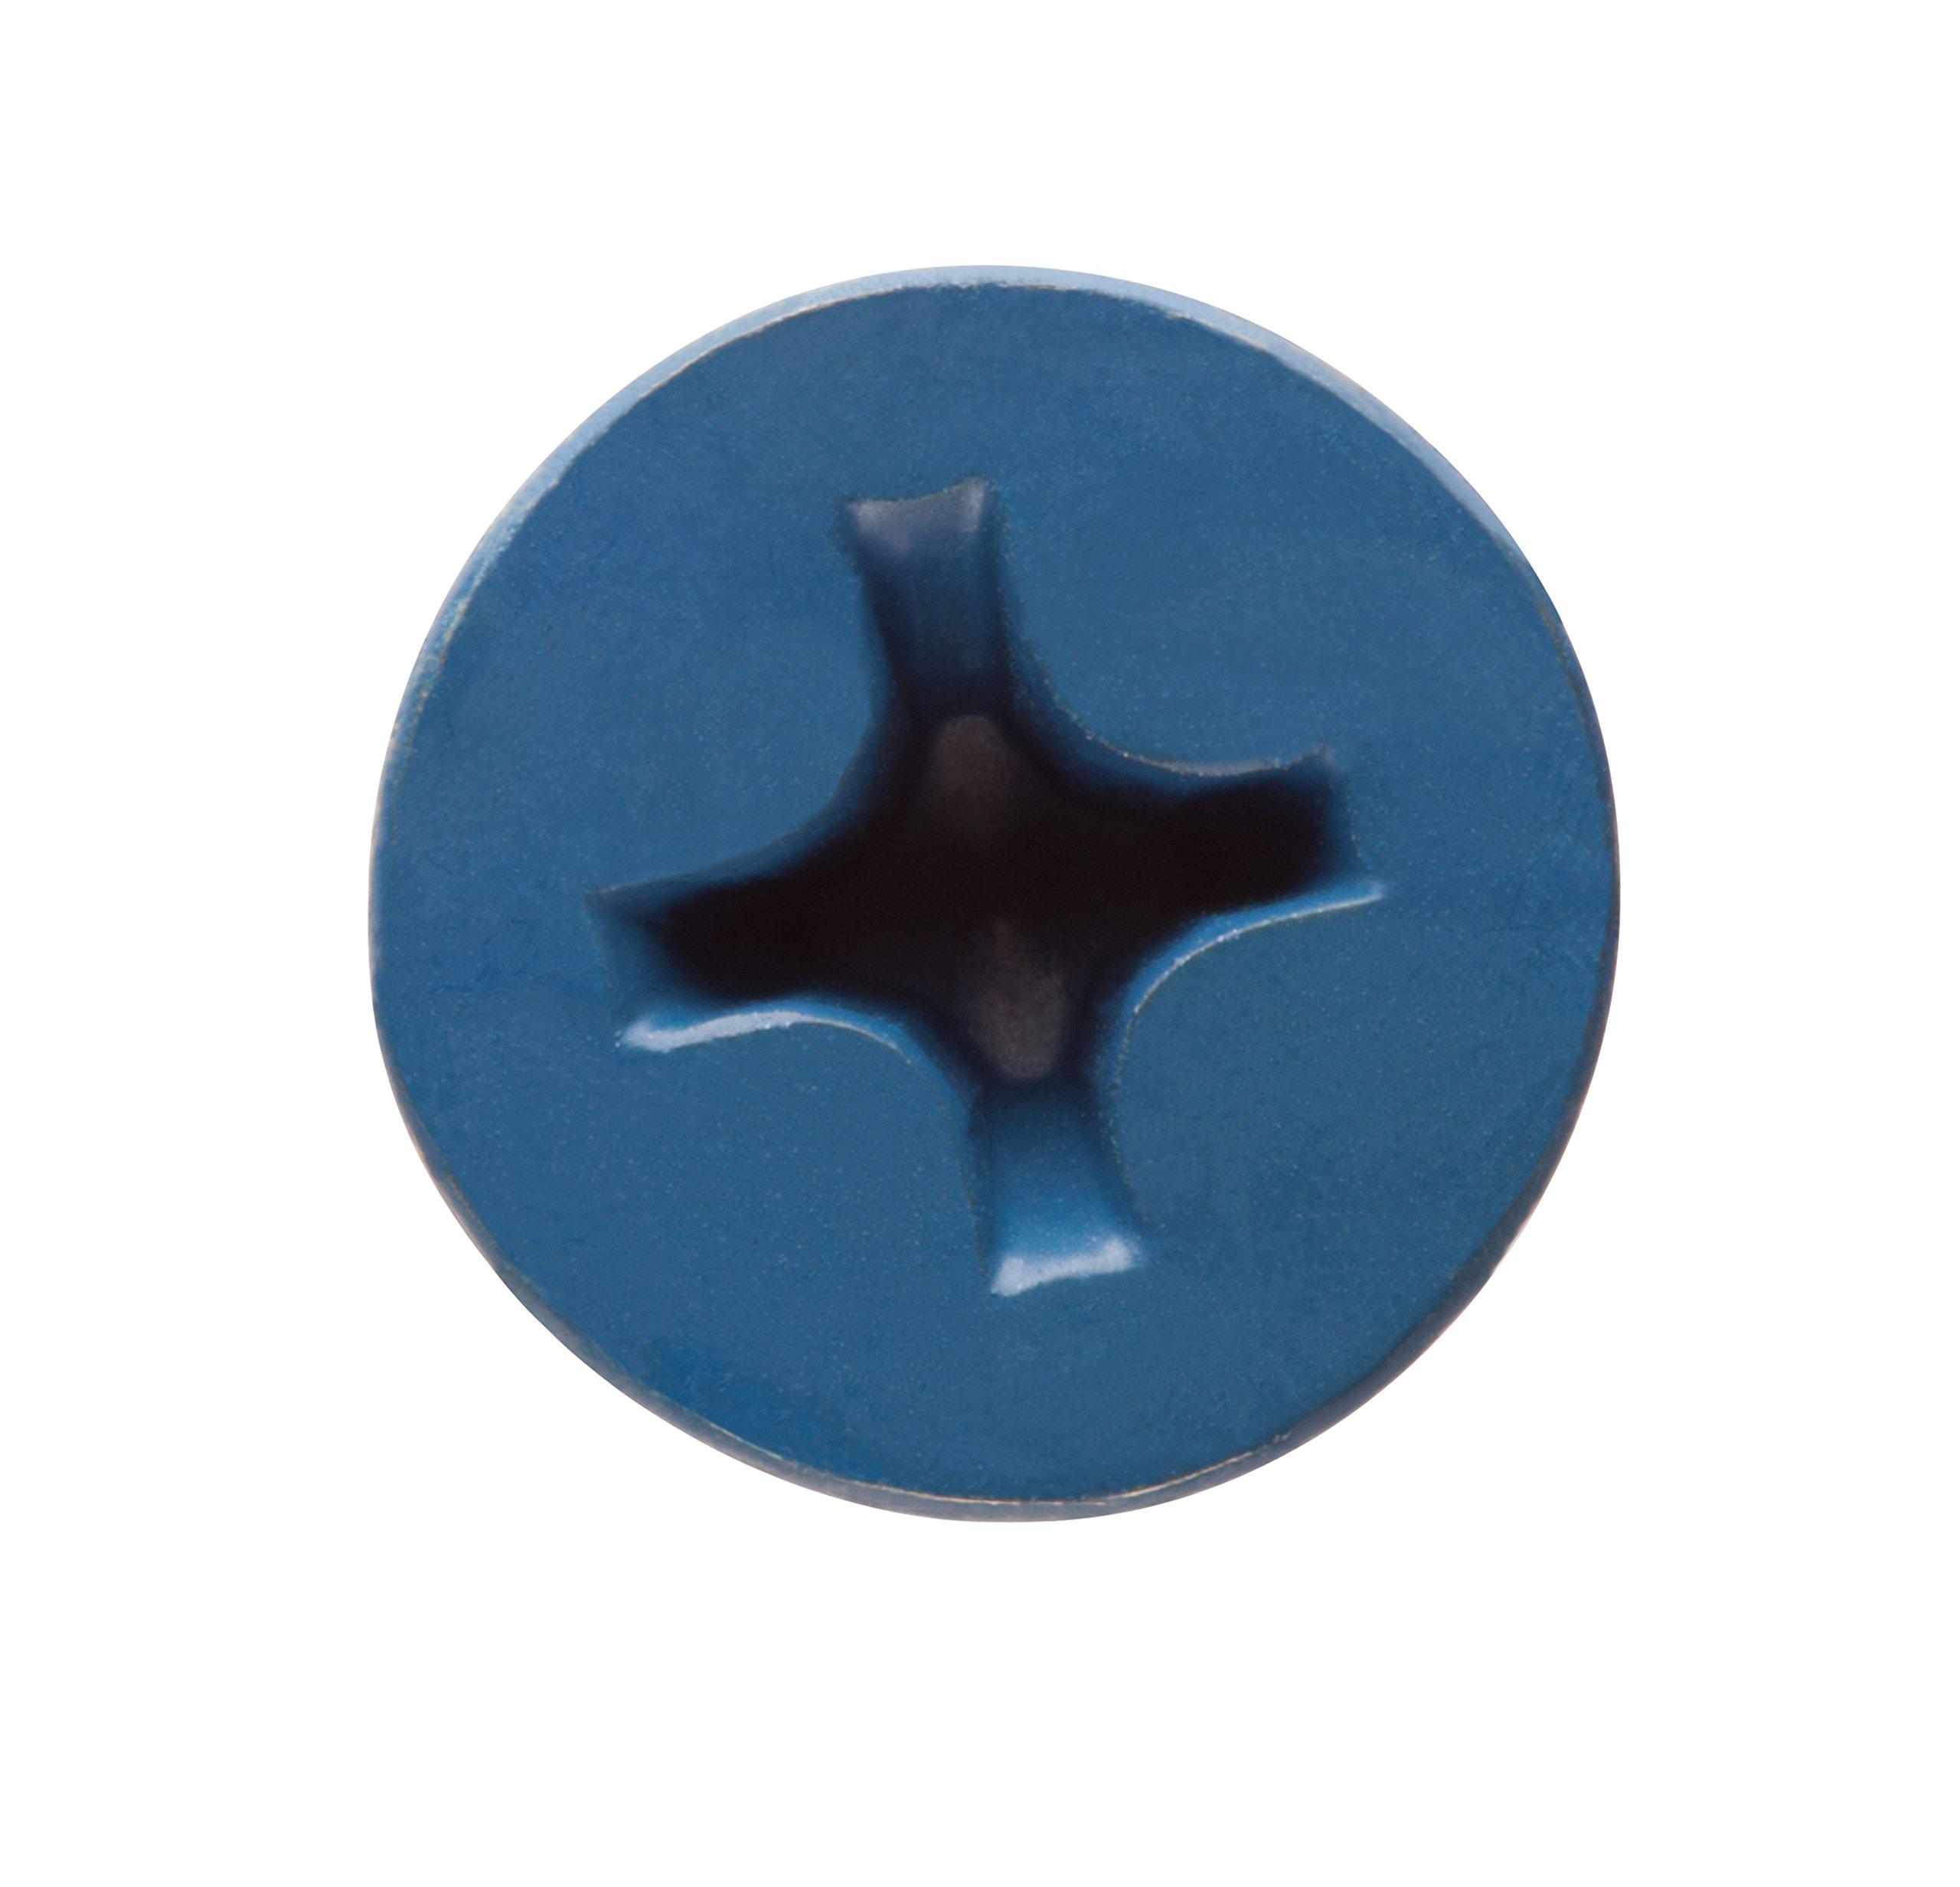 100 per Box CONFAST 3//16 x 3-1//4 Flat Phillips Concrete Screw Anchor with Drill Bit